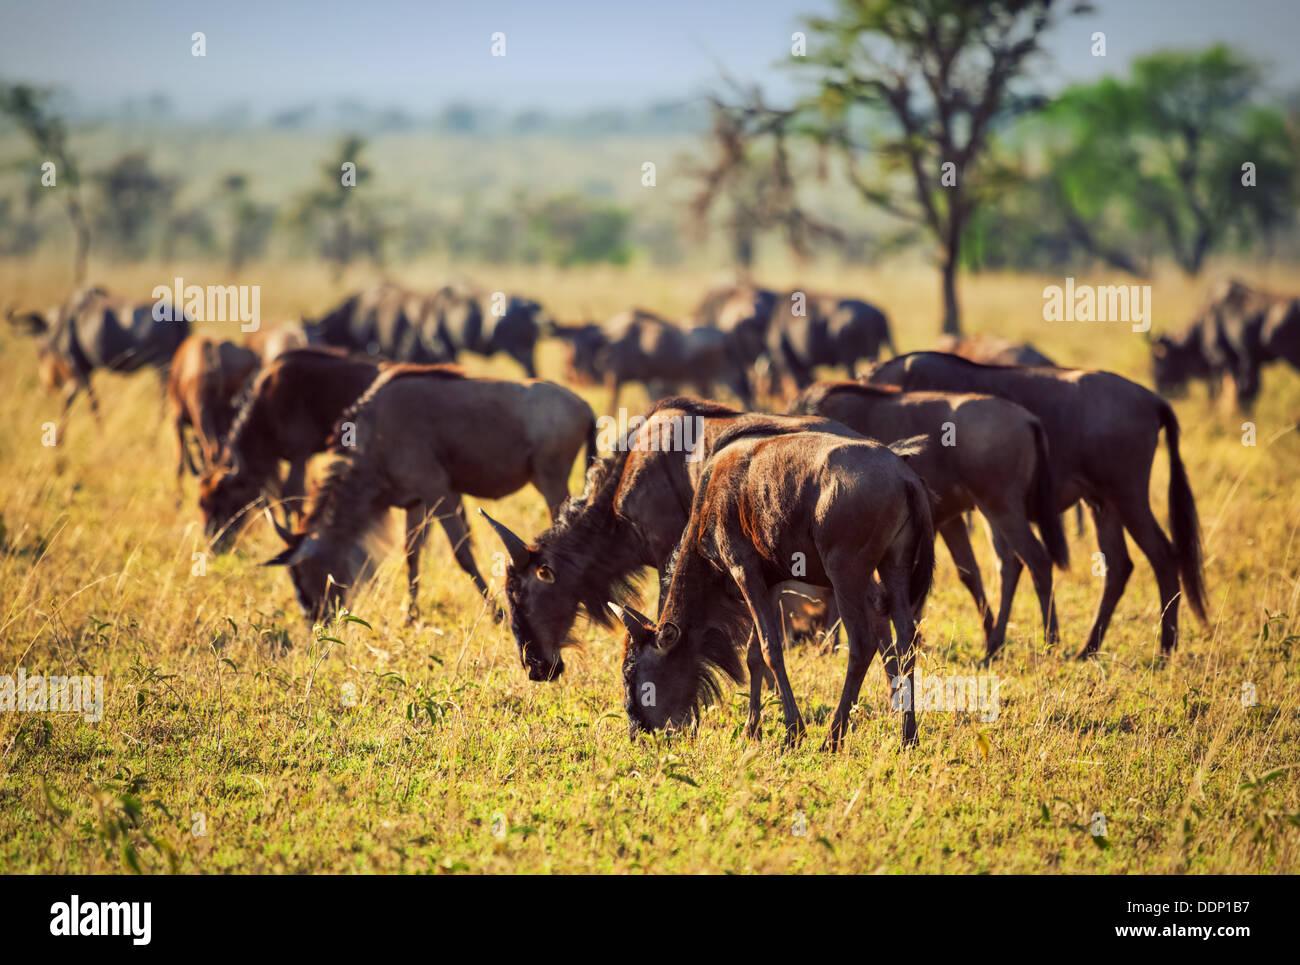 Wildlife - Wildebeest herd, Gnu in Serengeti National Park, Tanzania, Africa - Stock Image